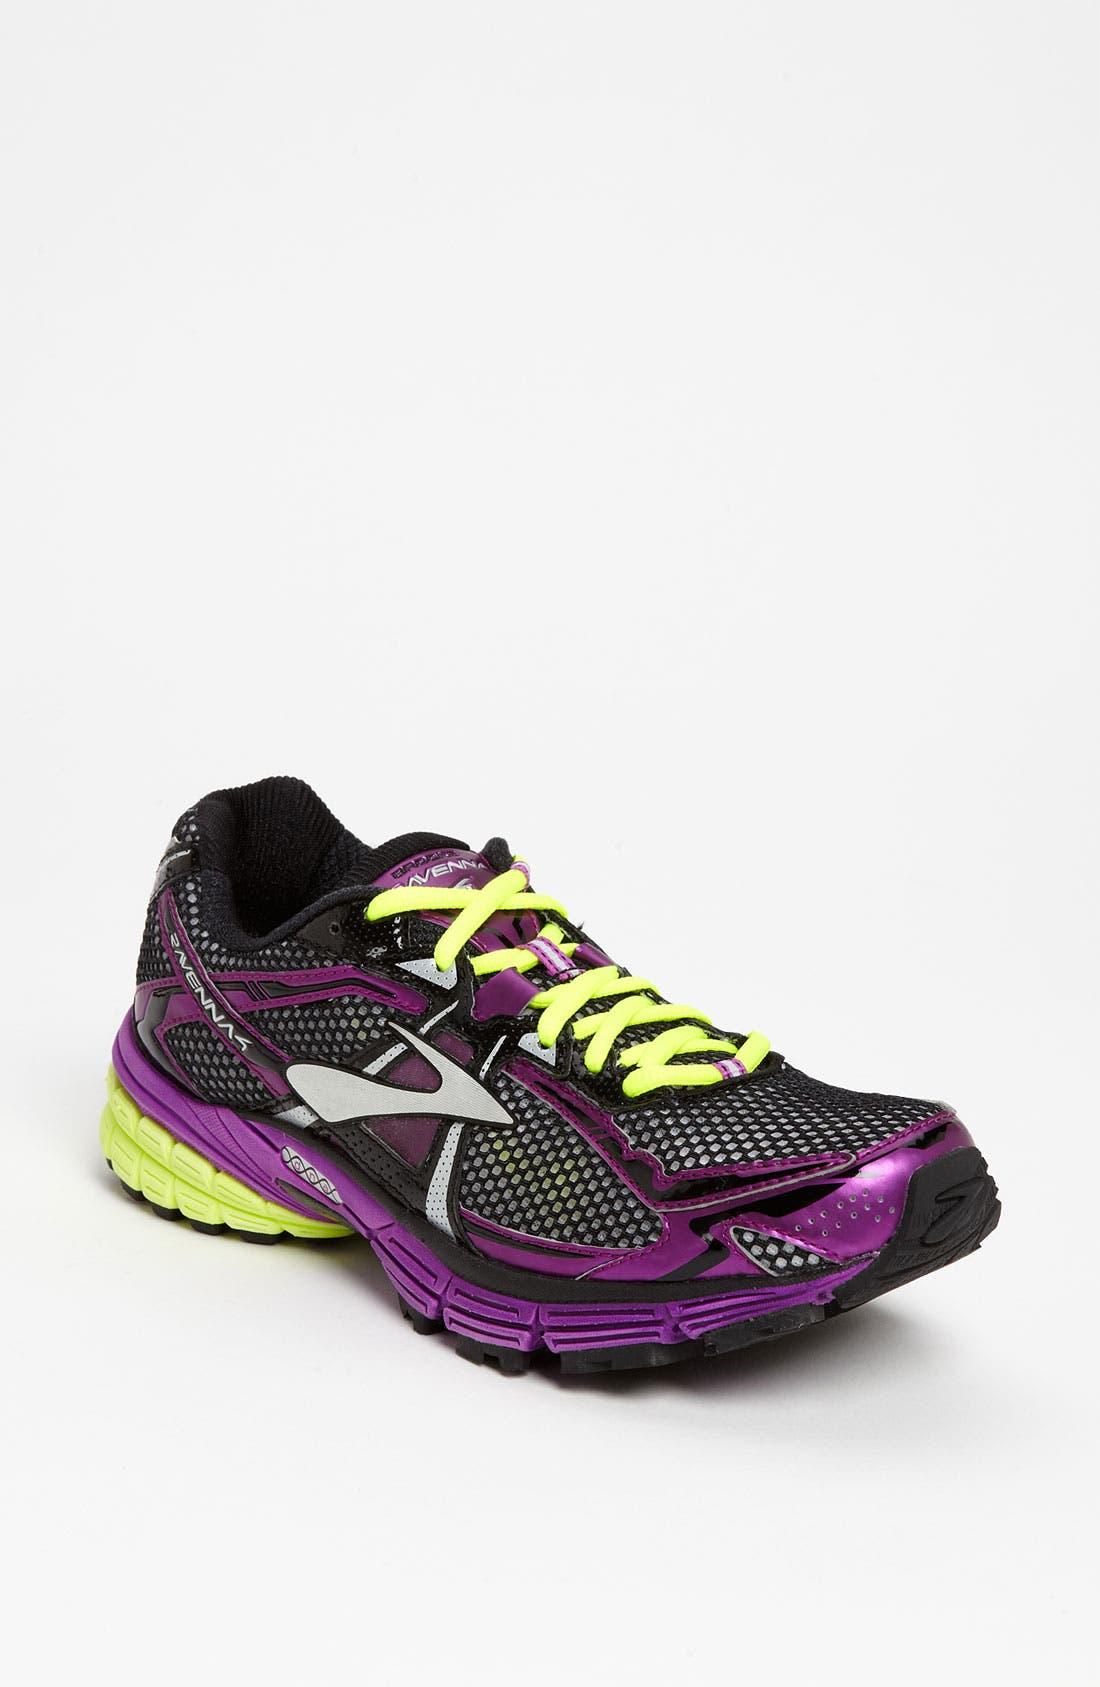 Main Image - Brooks 'Ravenna 4' Running Shoe (Women)(Regular Retail Price: $109.95)